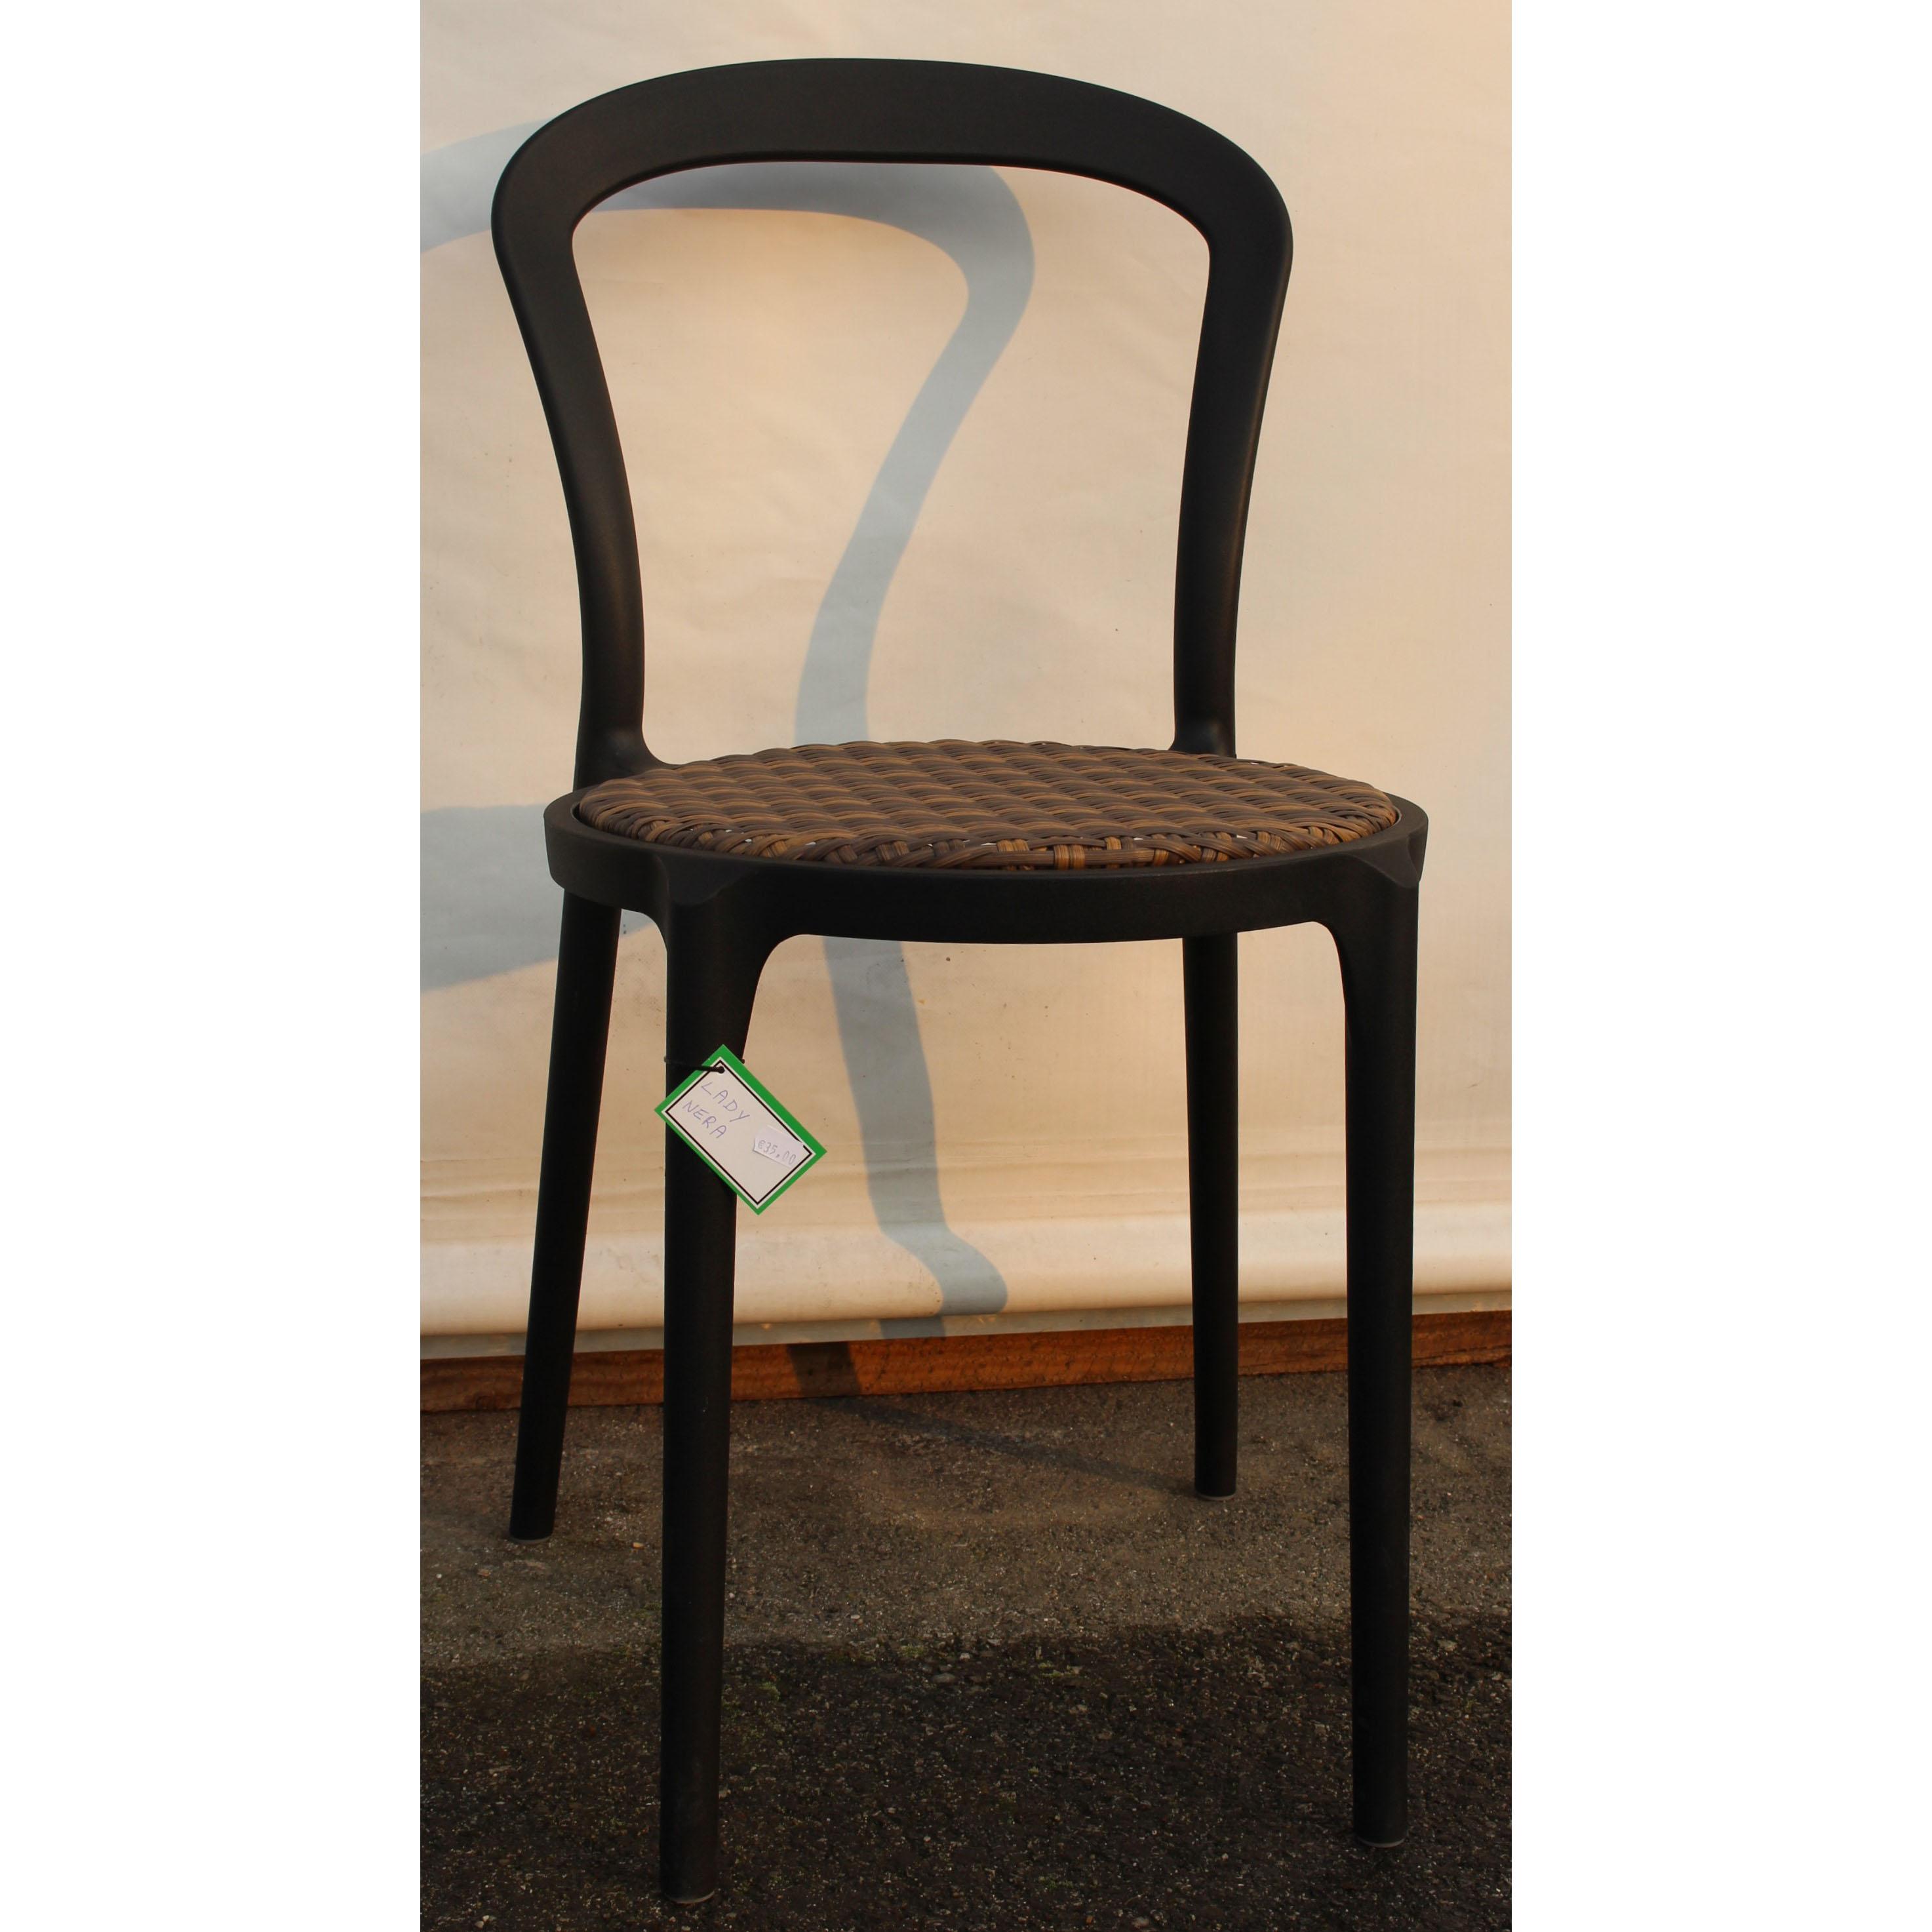 Sedia polipropilene da esterno o interno impilabile - Sedia polipropilene impilabile ...